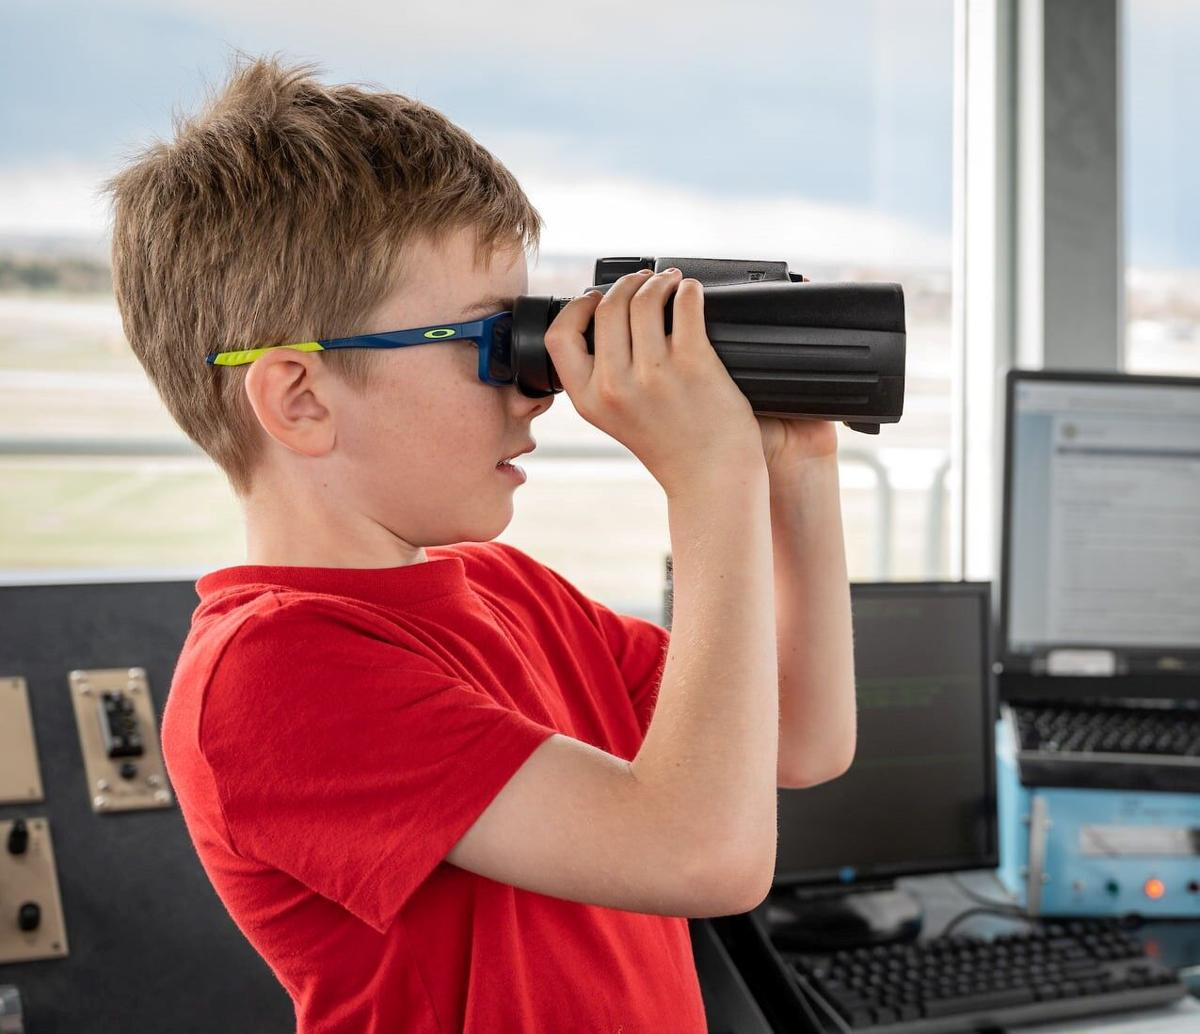 Kenny Watt with binoculars